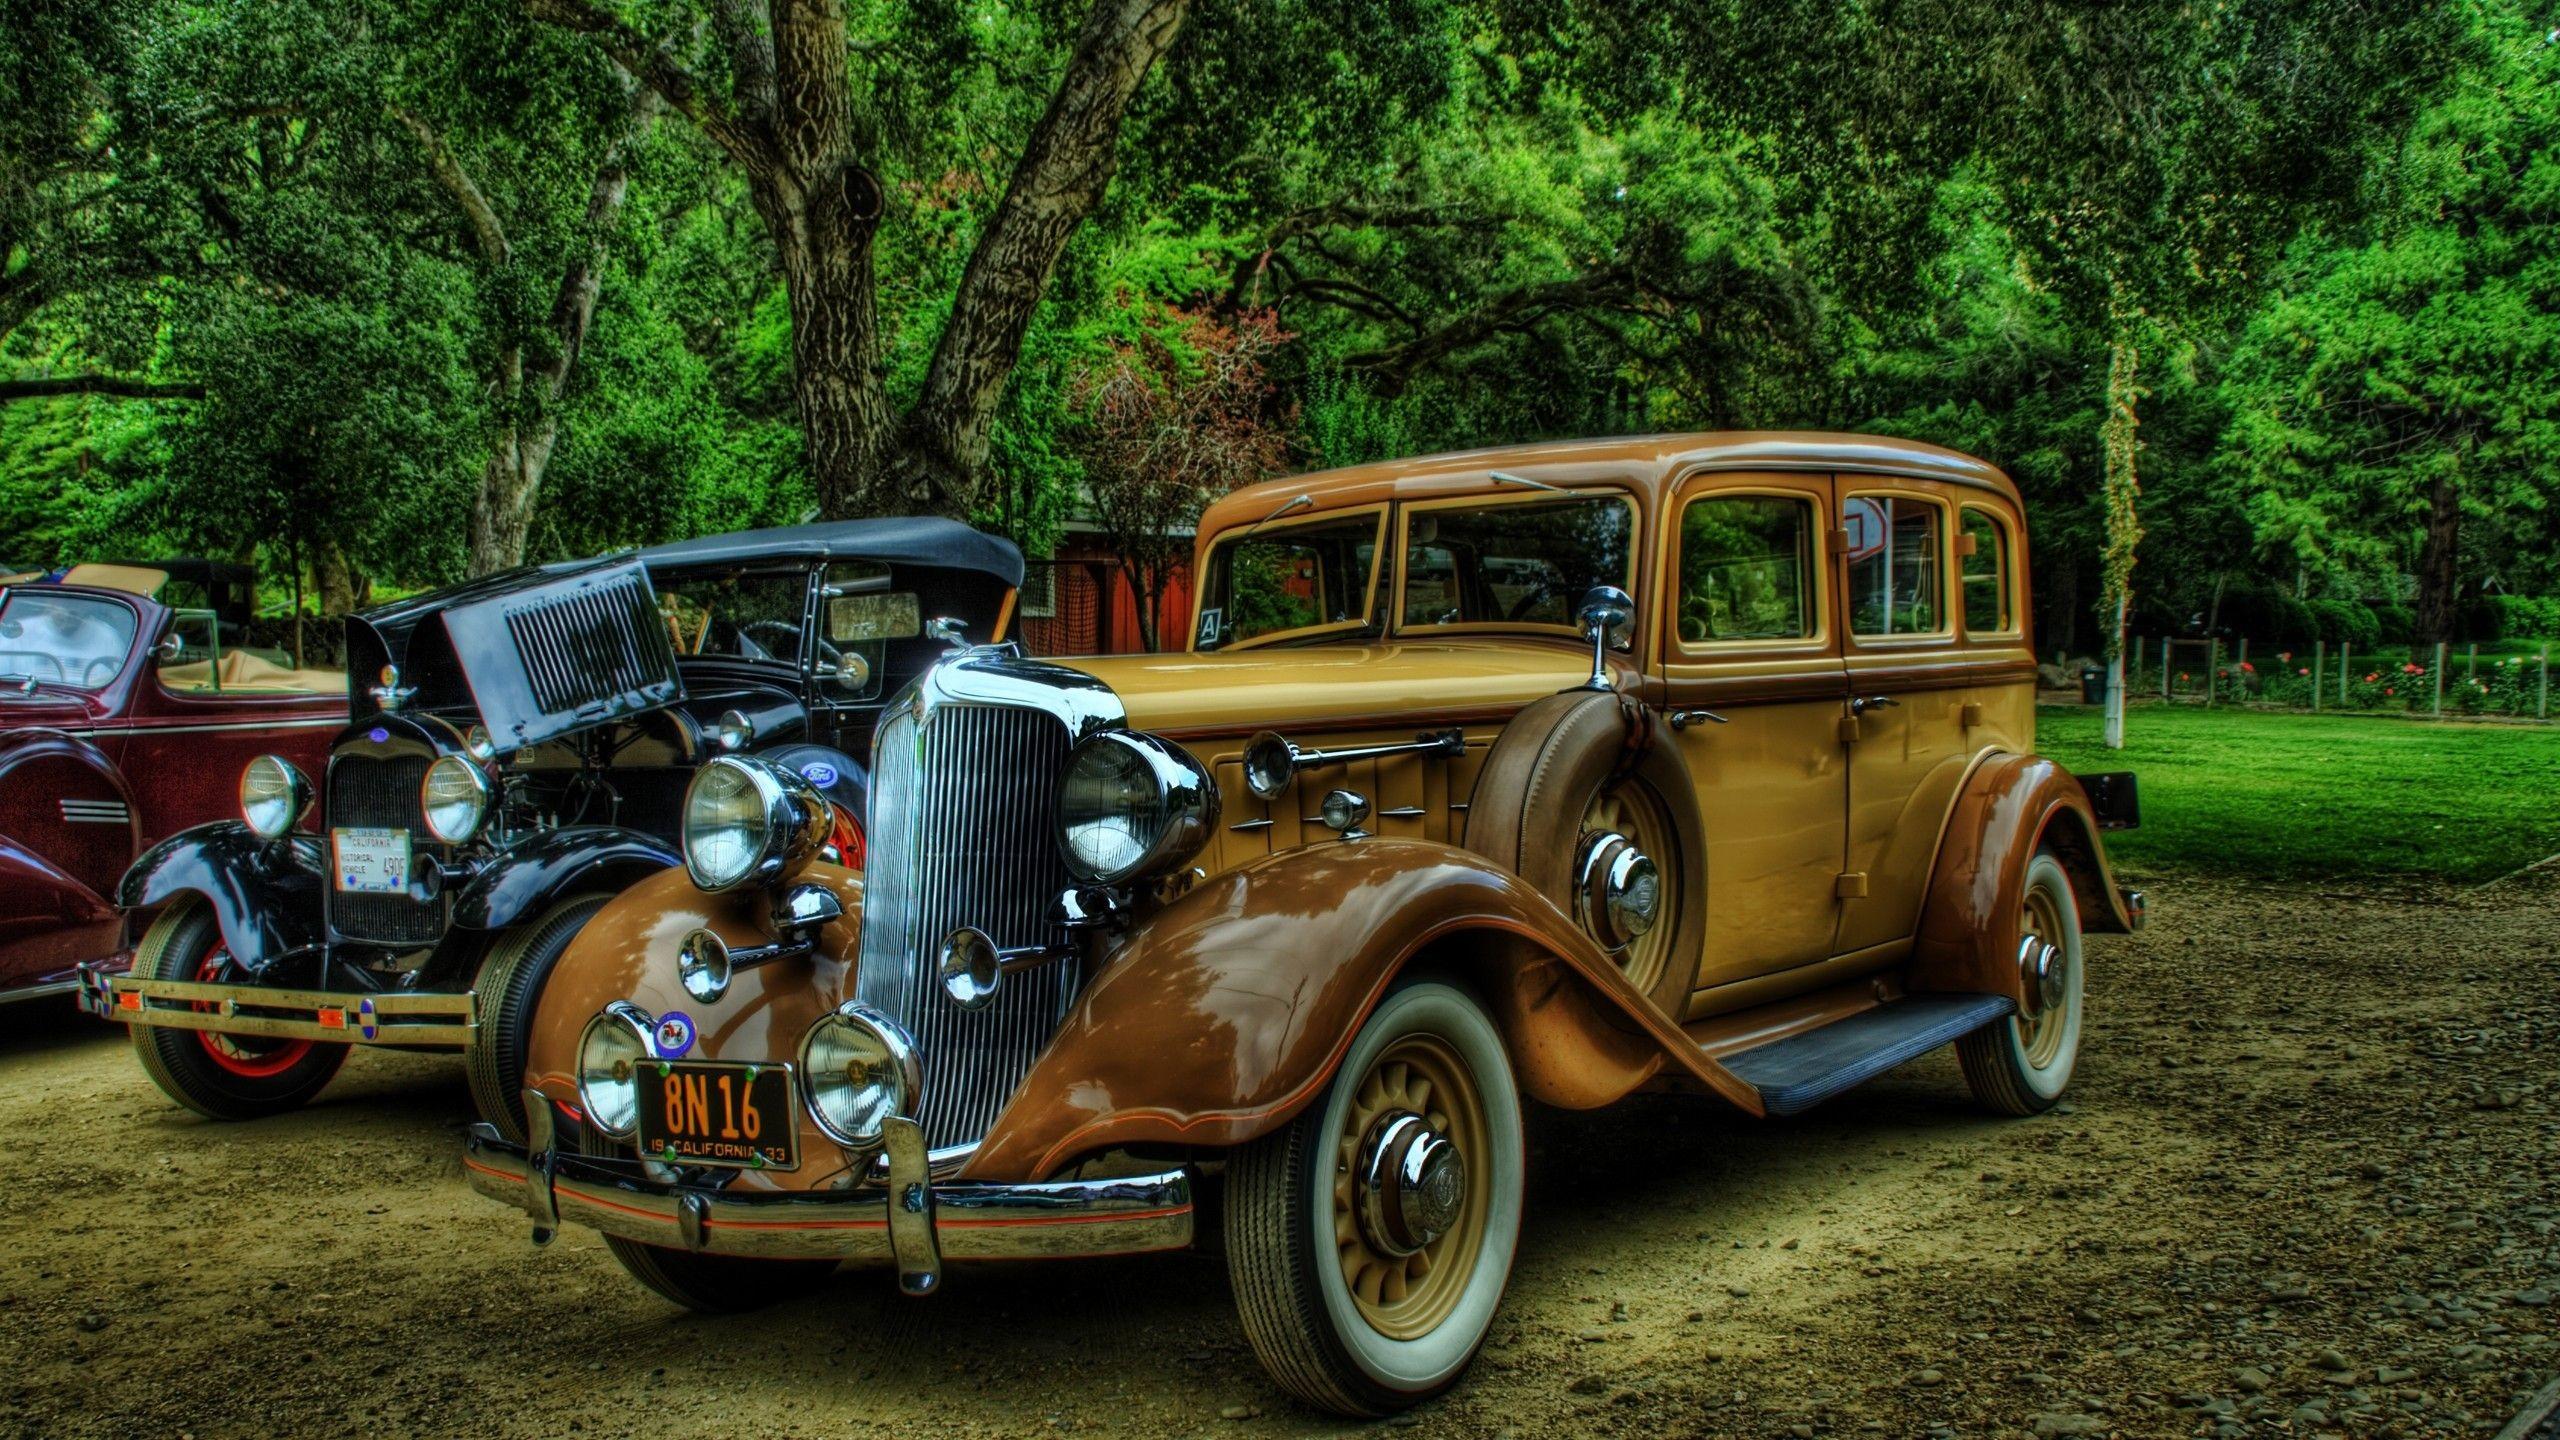 Res: 2560x1440, Vintage Car Wallpaper No Parking Pinterest Cars Vintage and